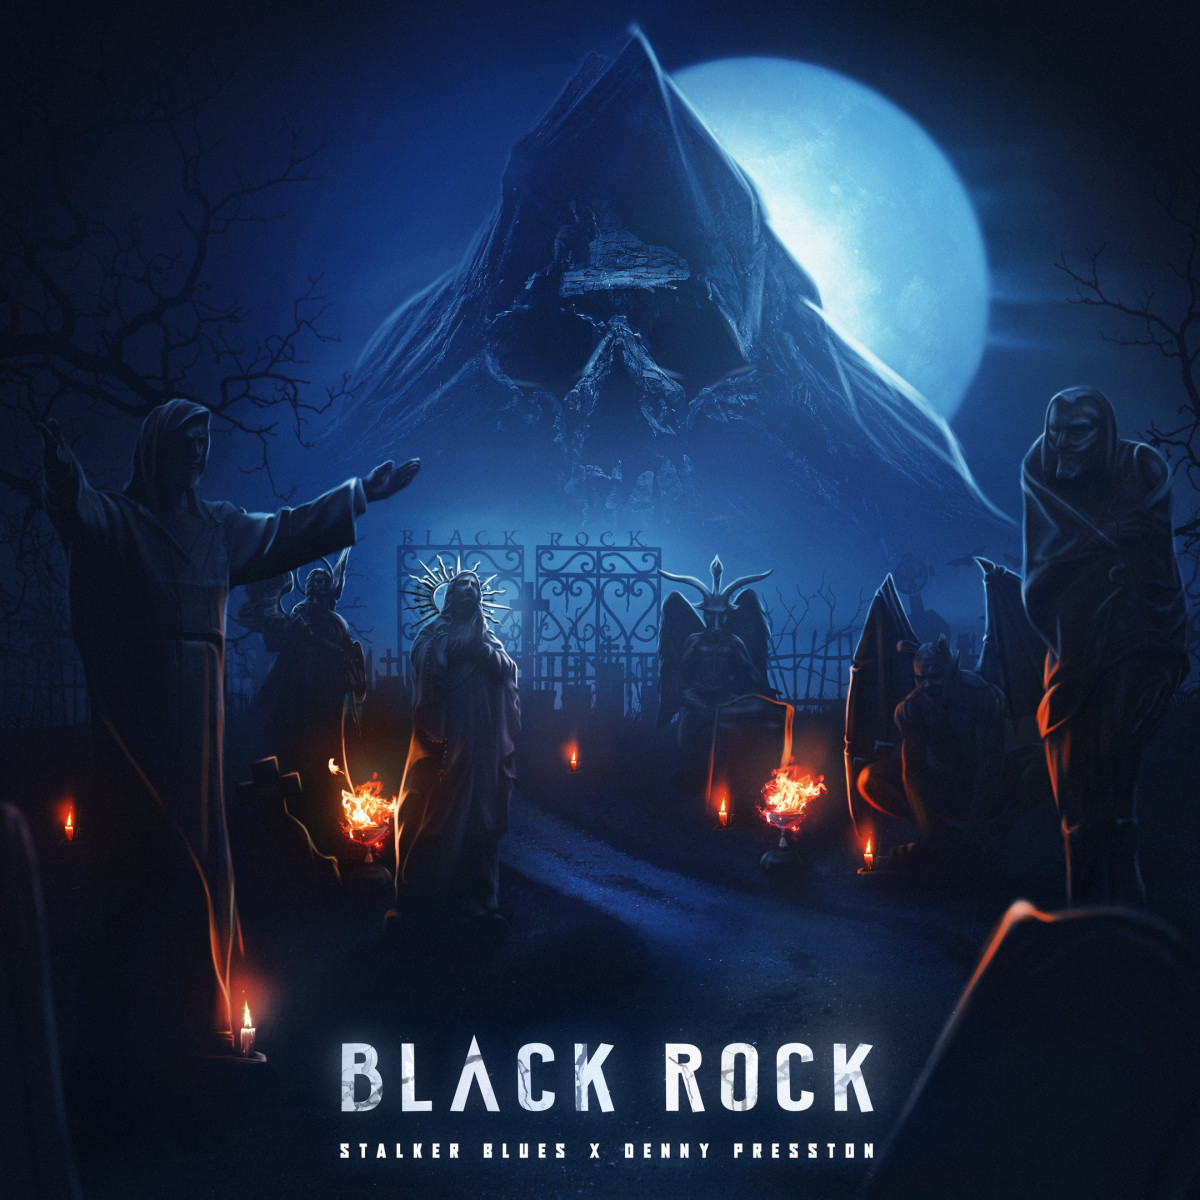 Stalker Blues & Denny Presston — «Black Rock»